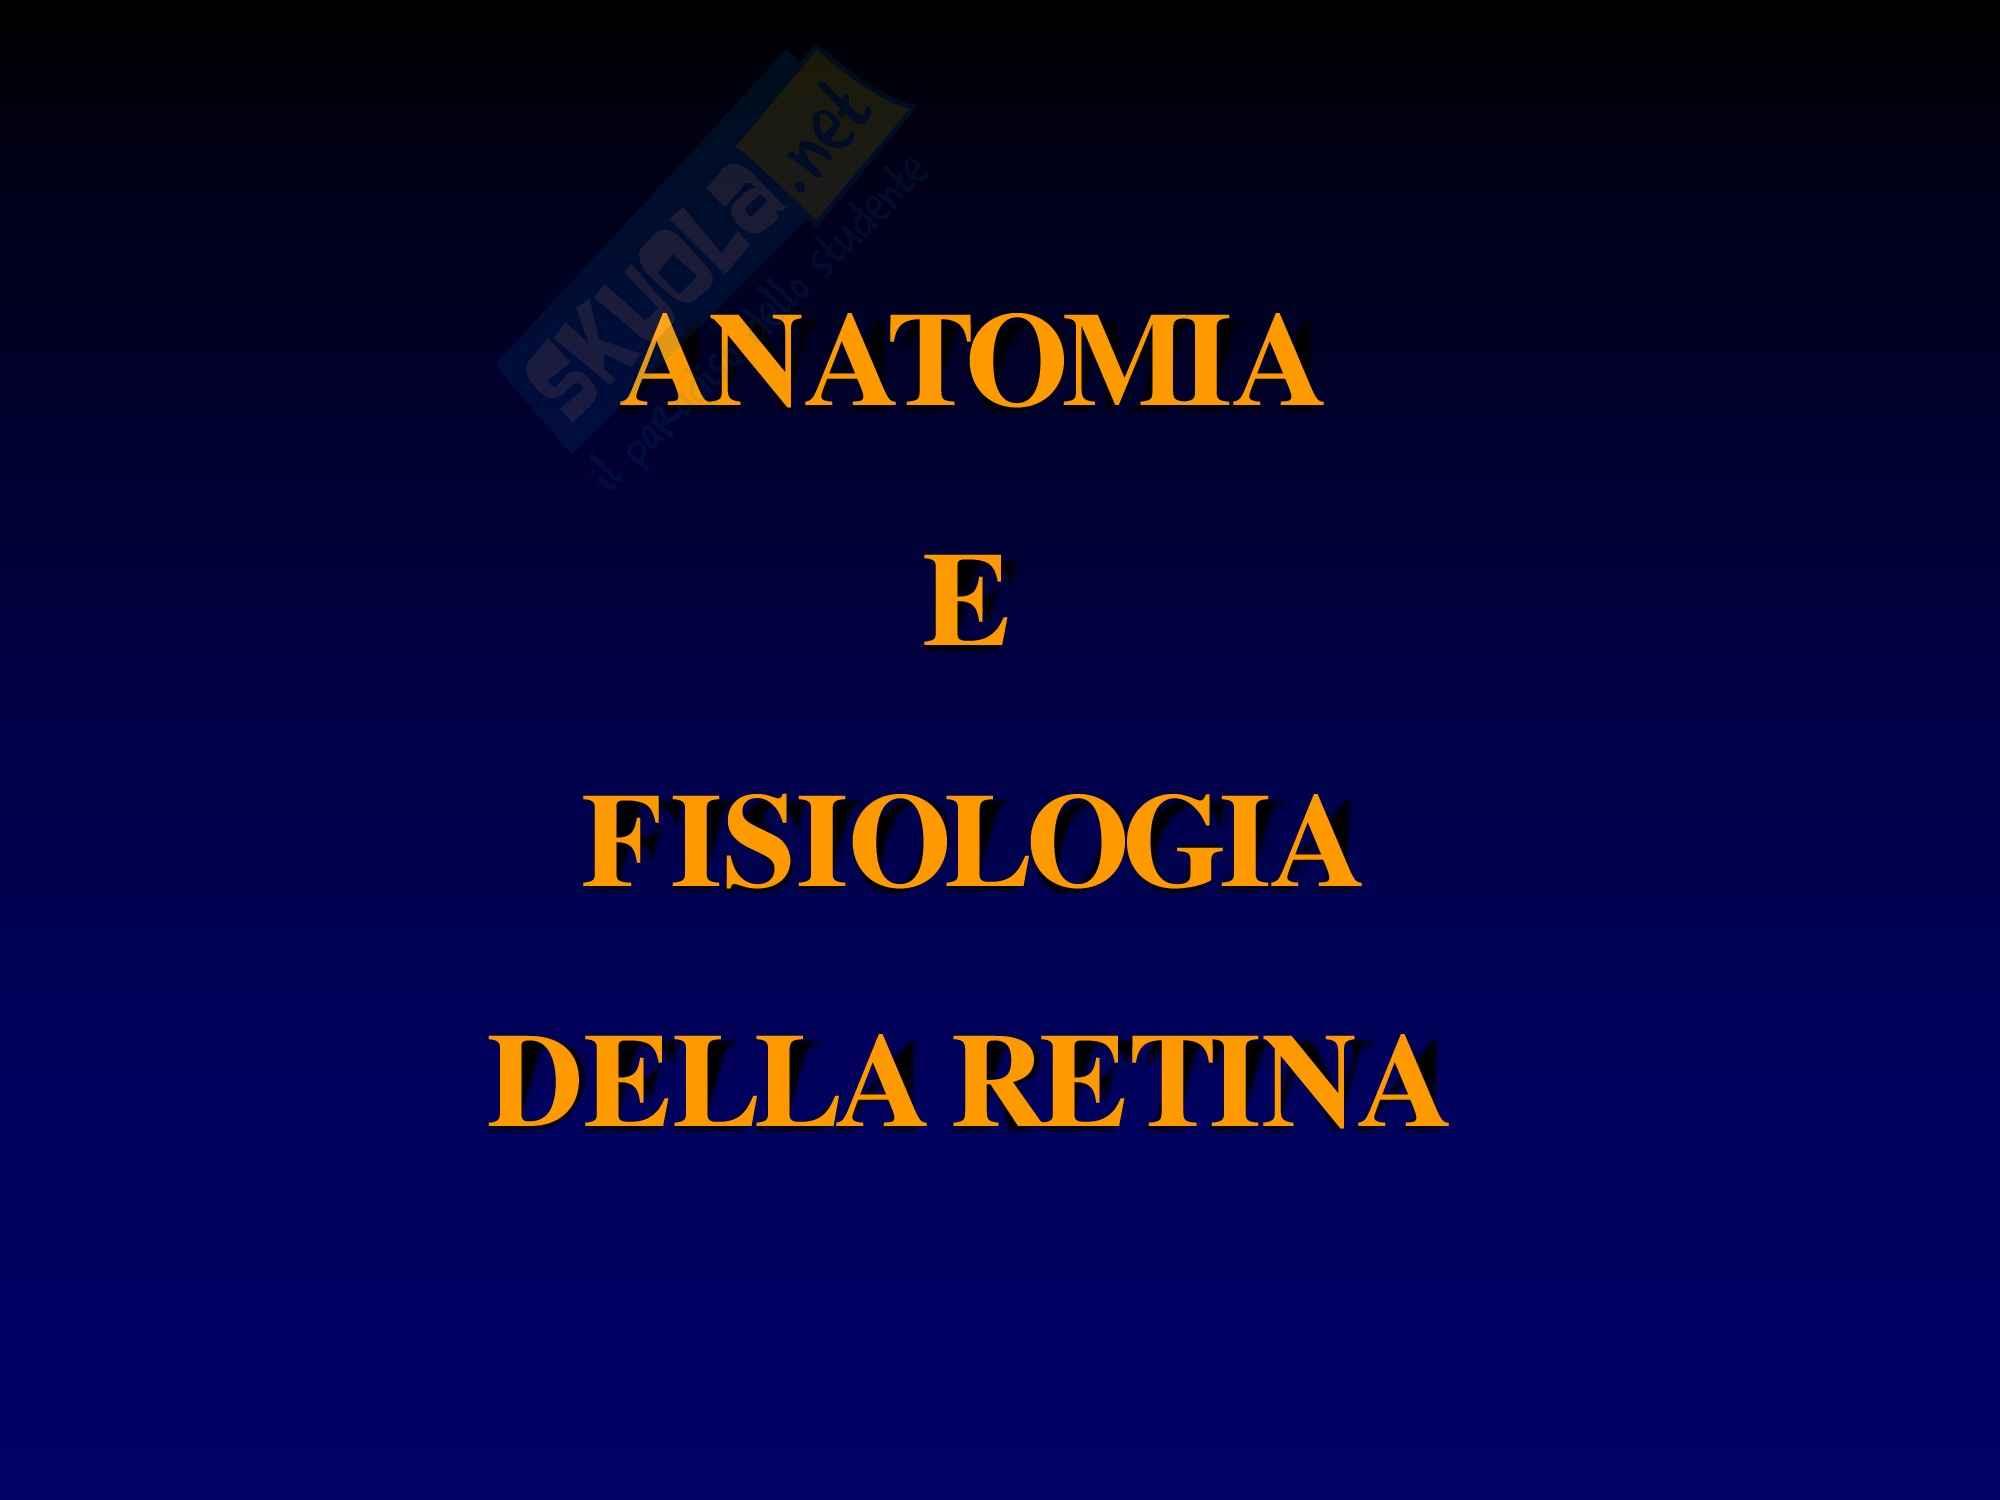 Retina - Anatomia e Fisiologia